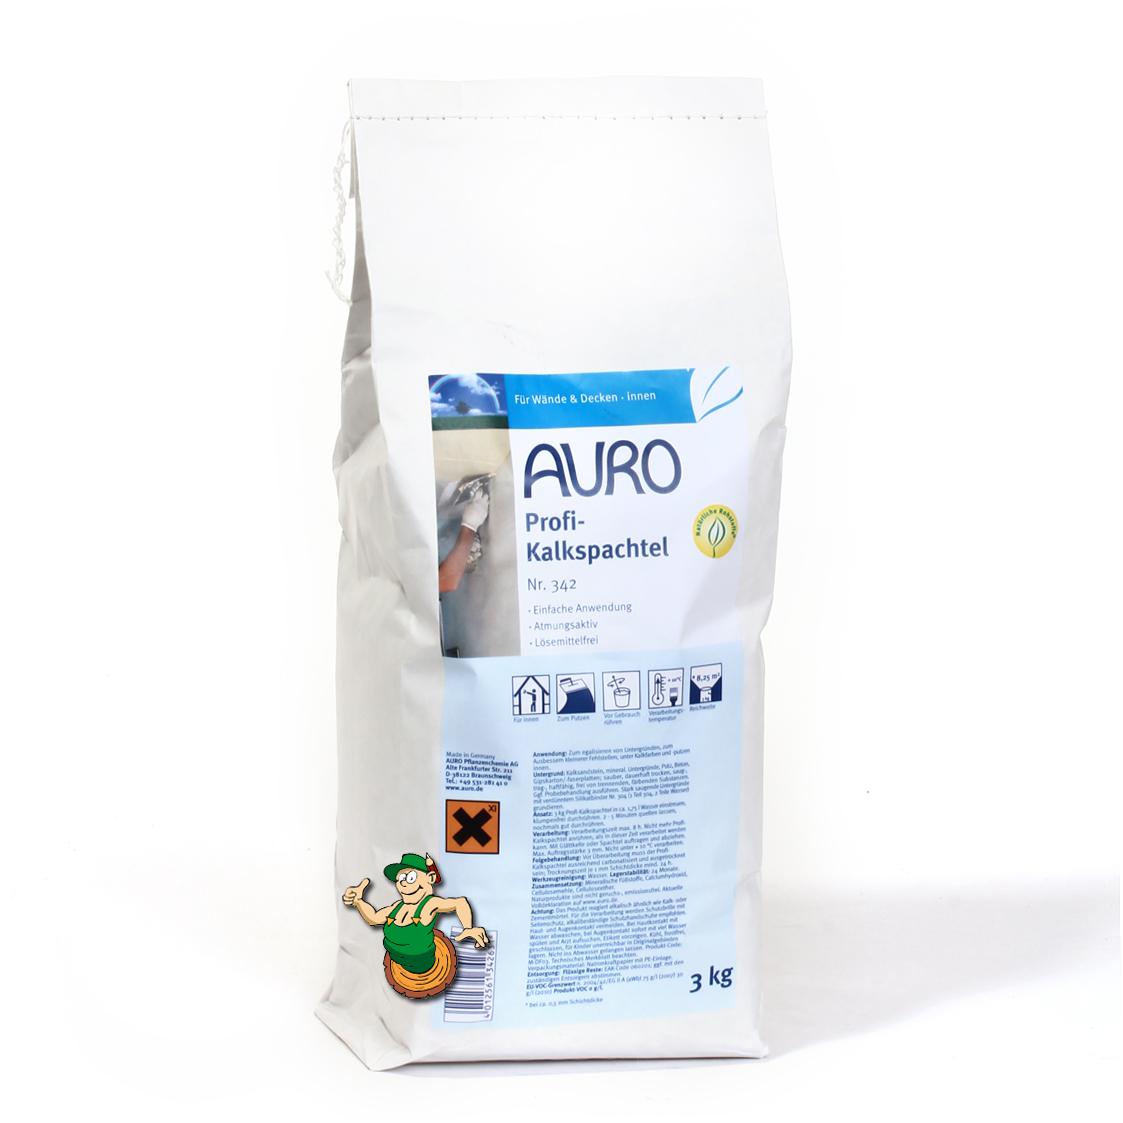 auro profi-kalkspachtel nr. 342 | auro shop